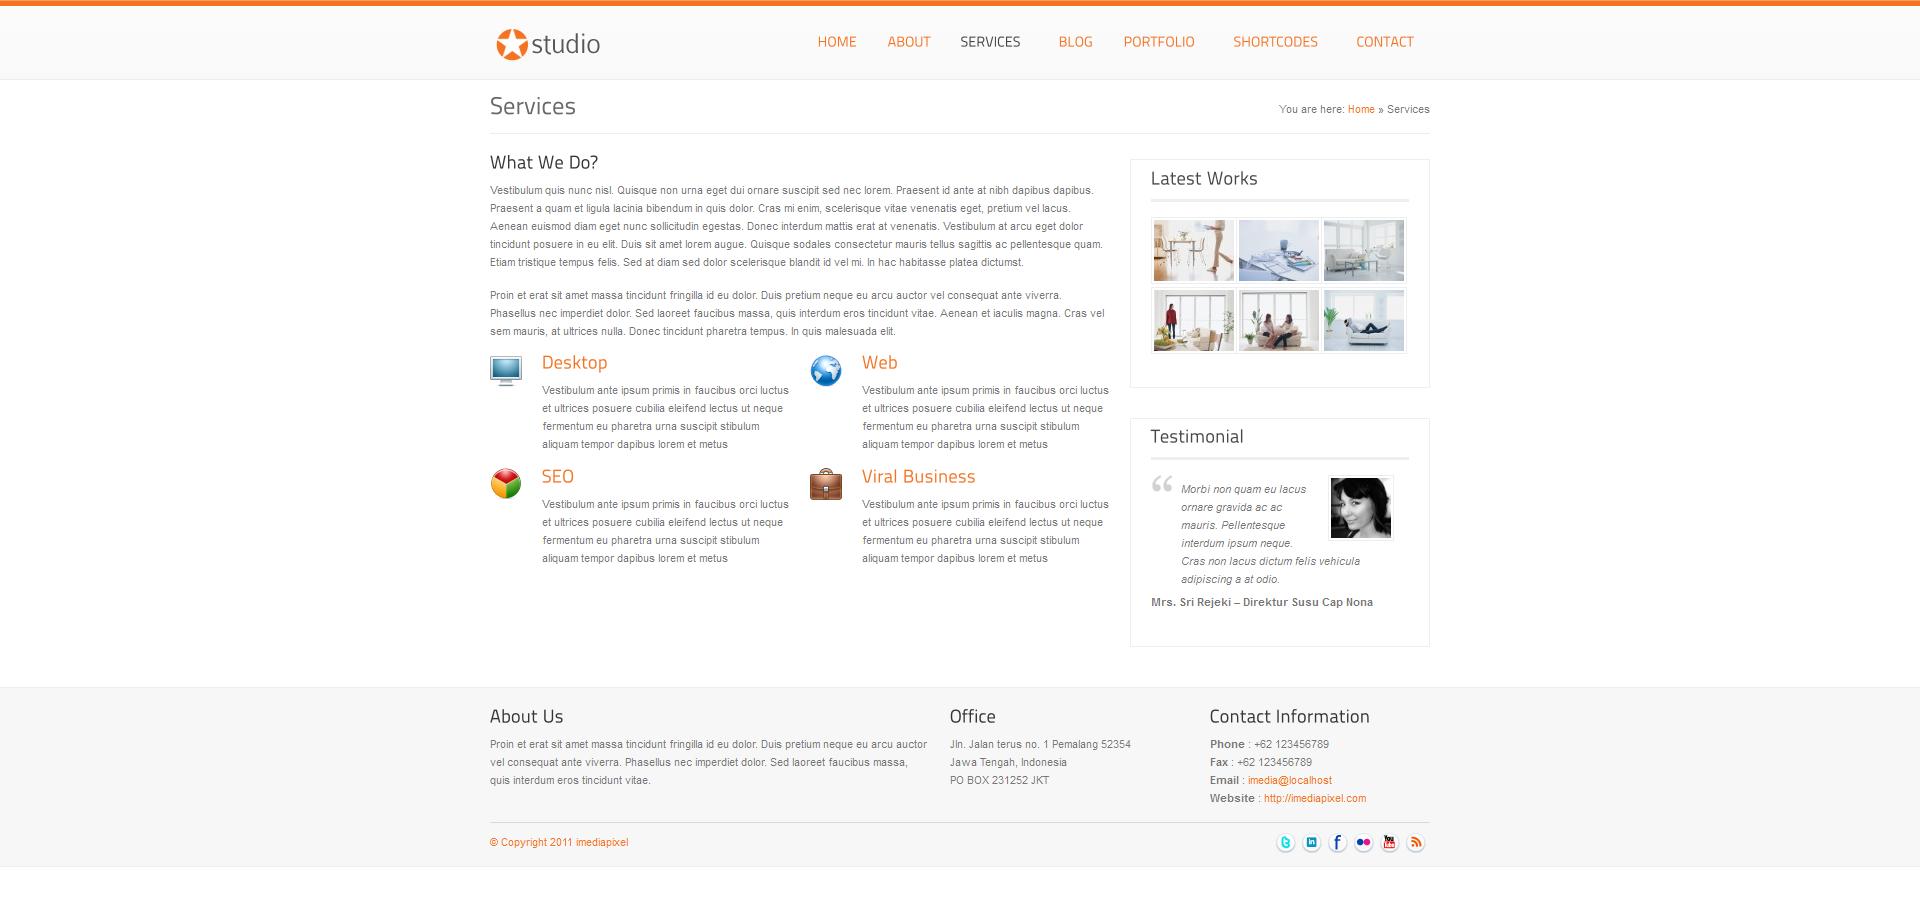 istudio - Clean and Minimalist Business Theme